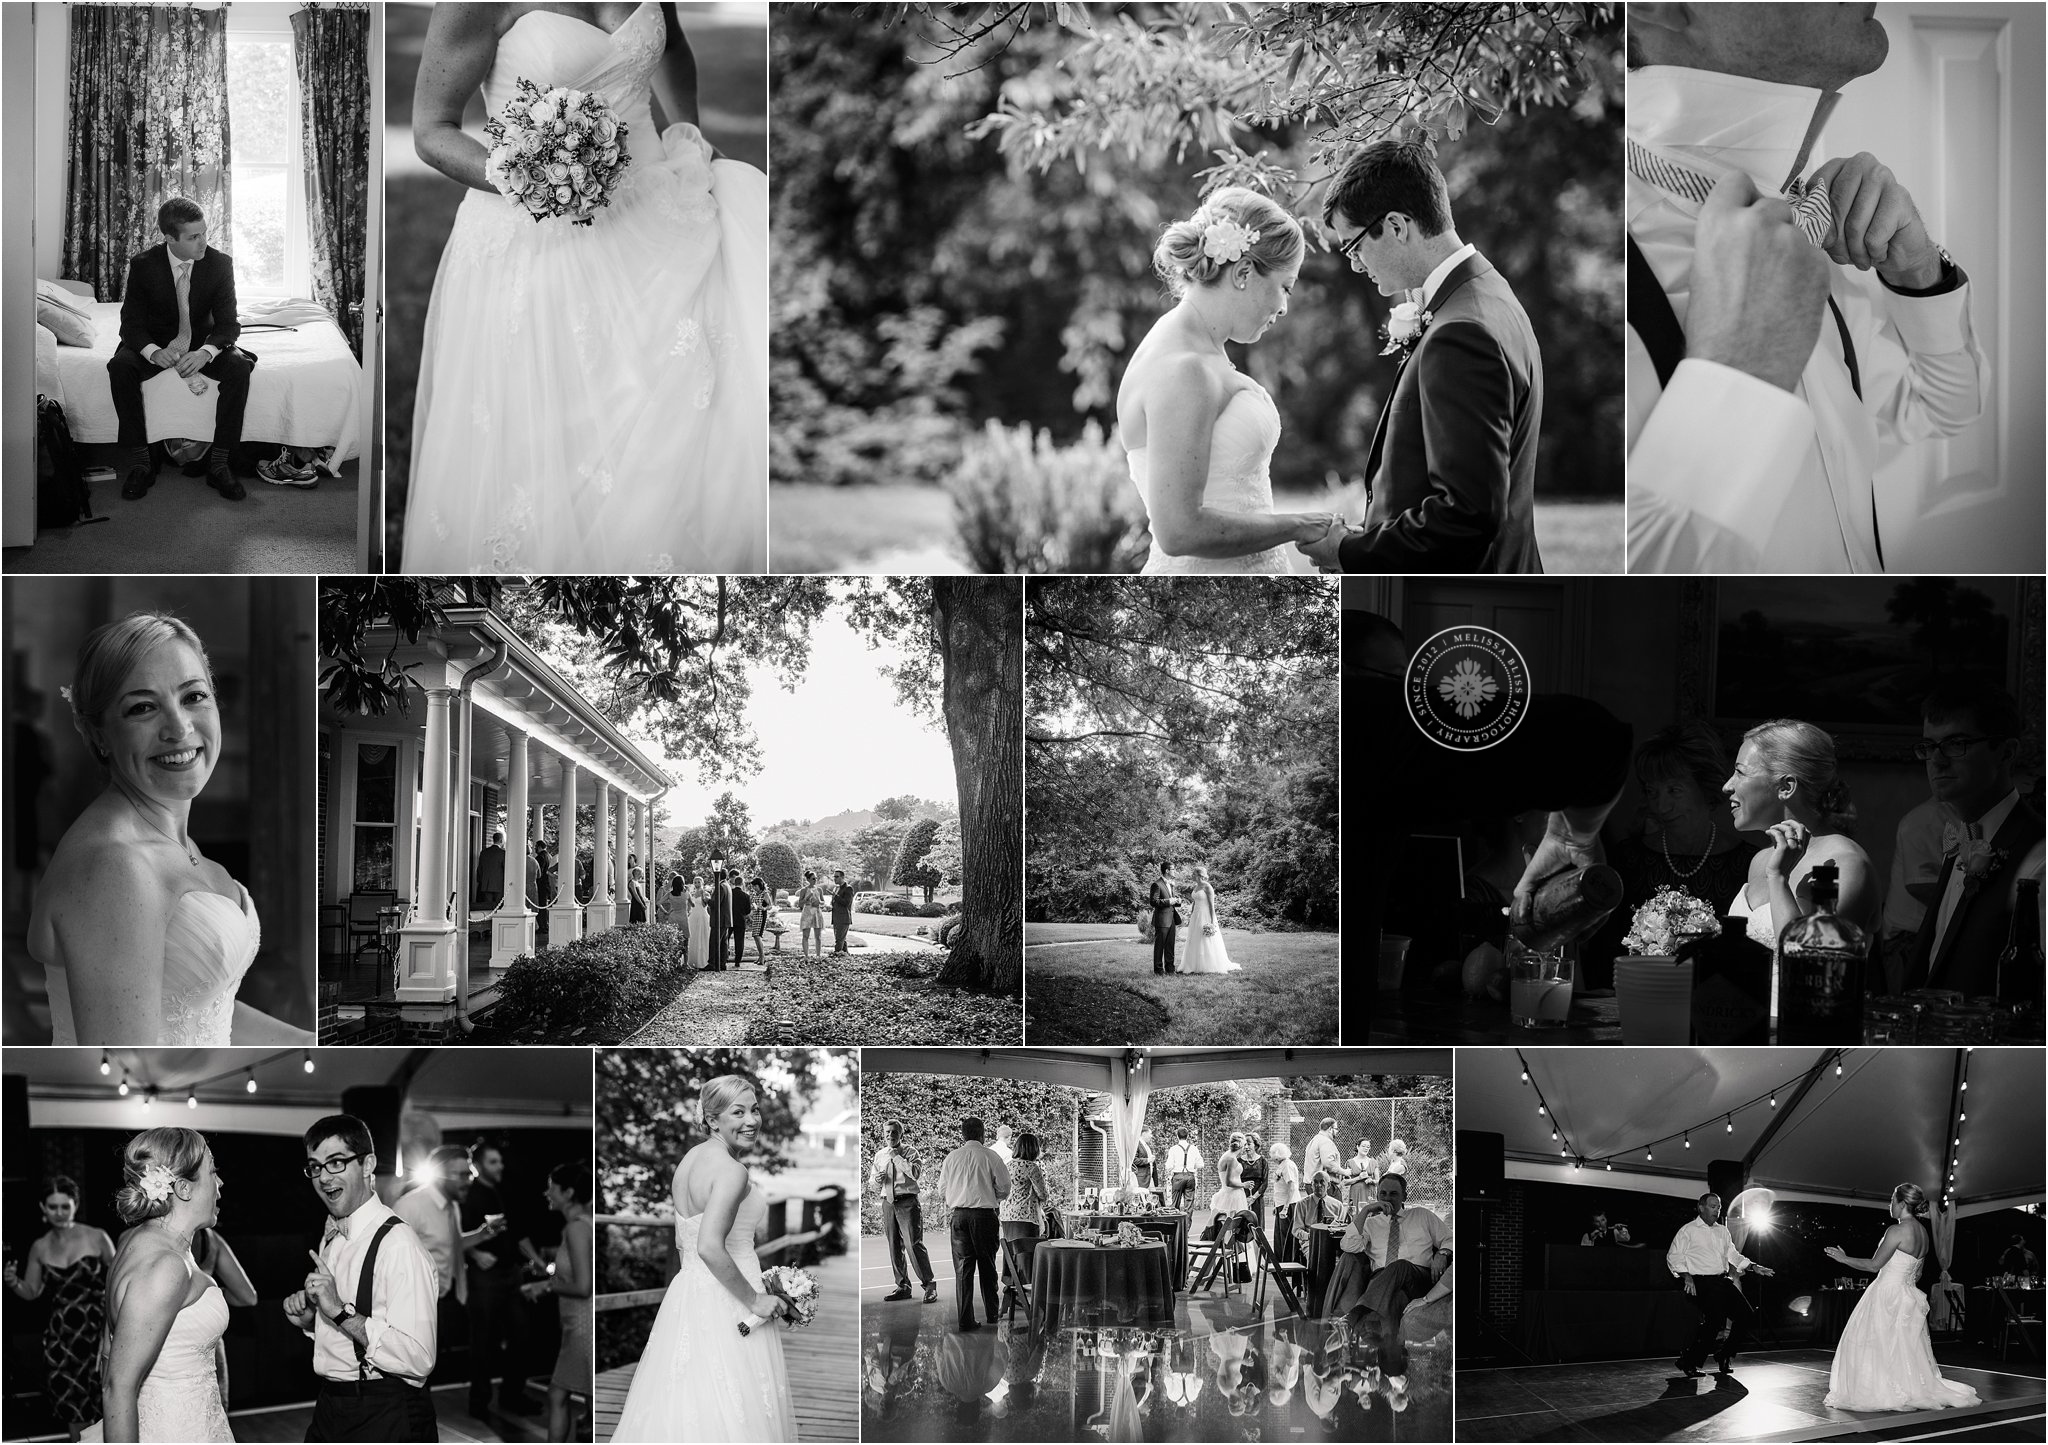 melissa-bliss-photography-virginia-beach-documentary-wedding-photography-norfolk-portsmouth-chesapeake-williamsburg-wedding-photographers